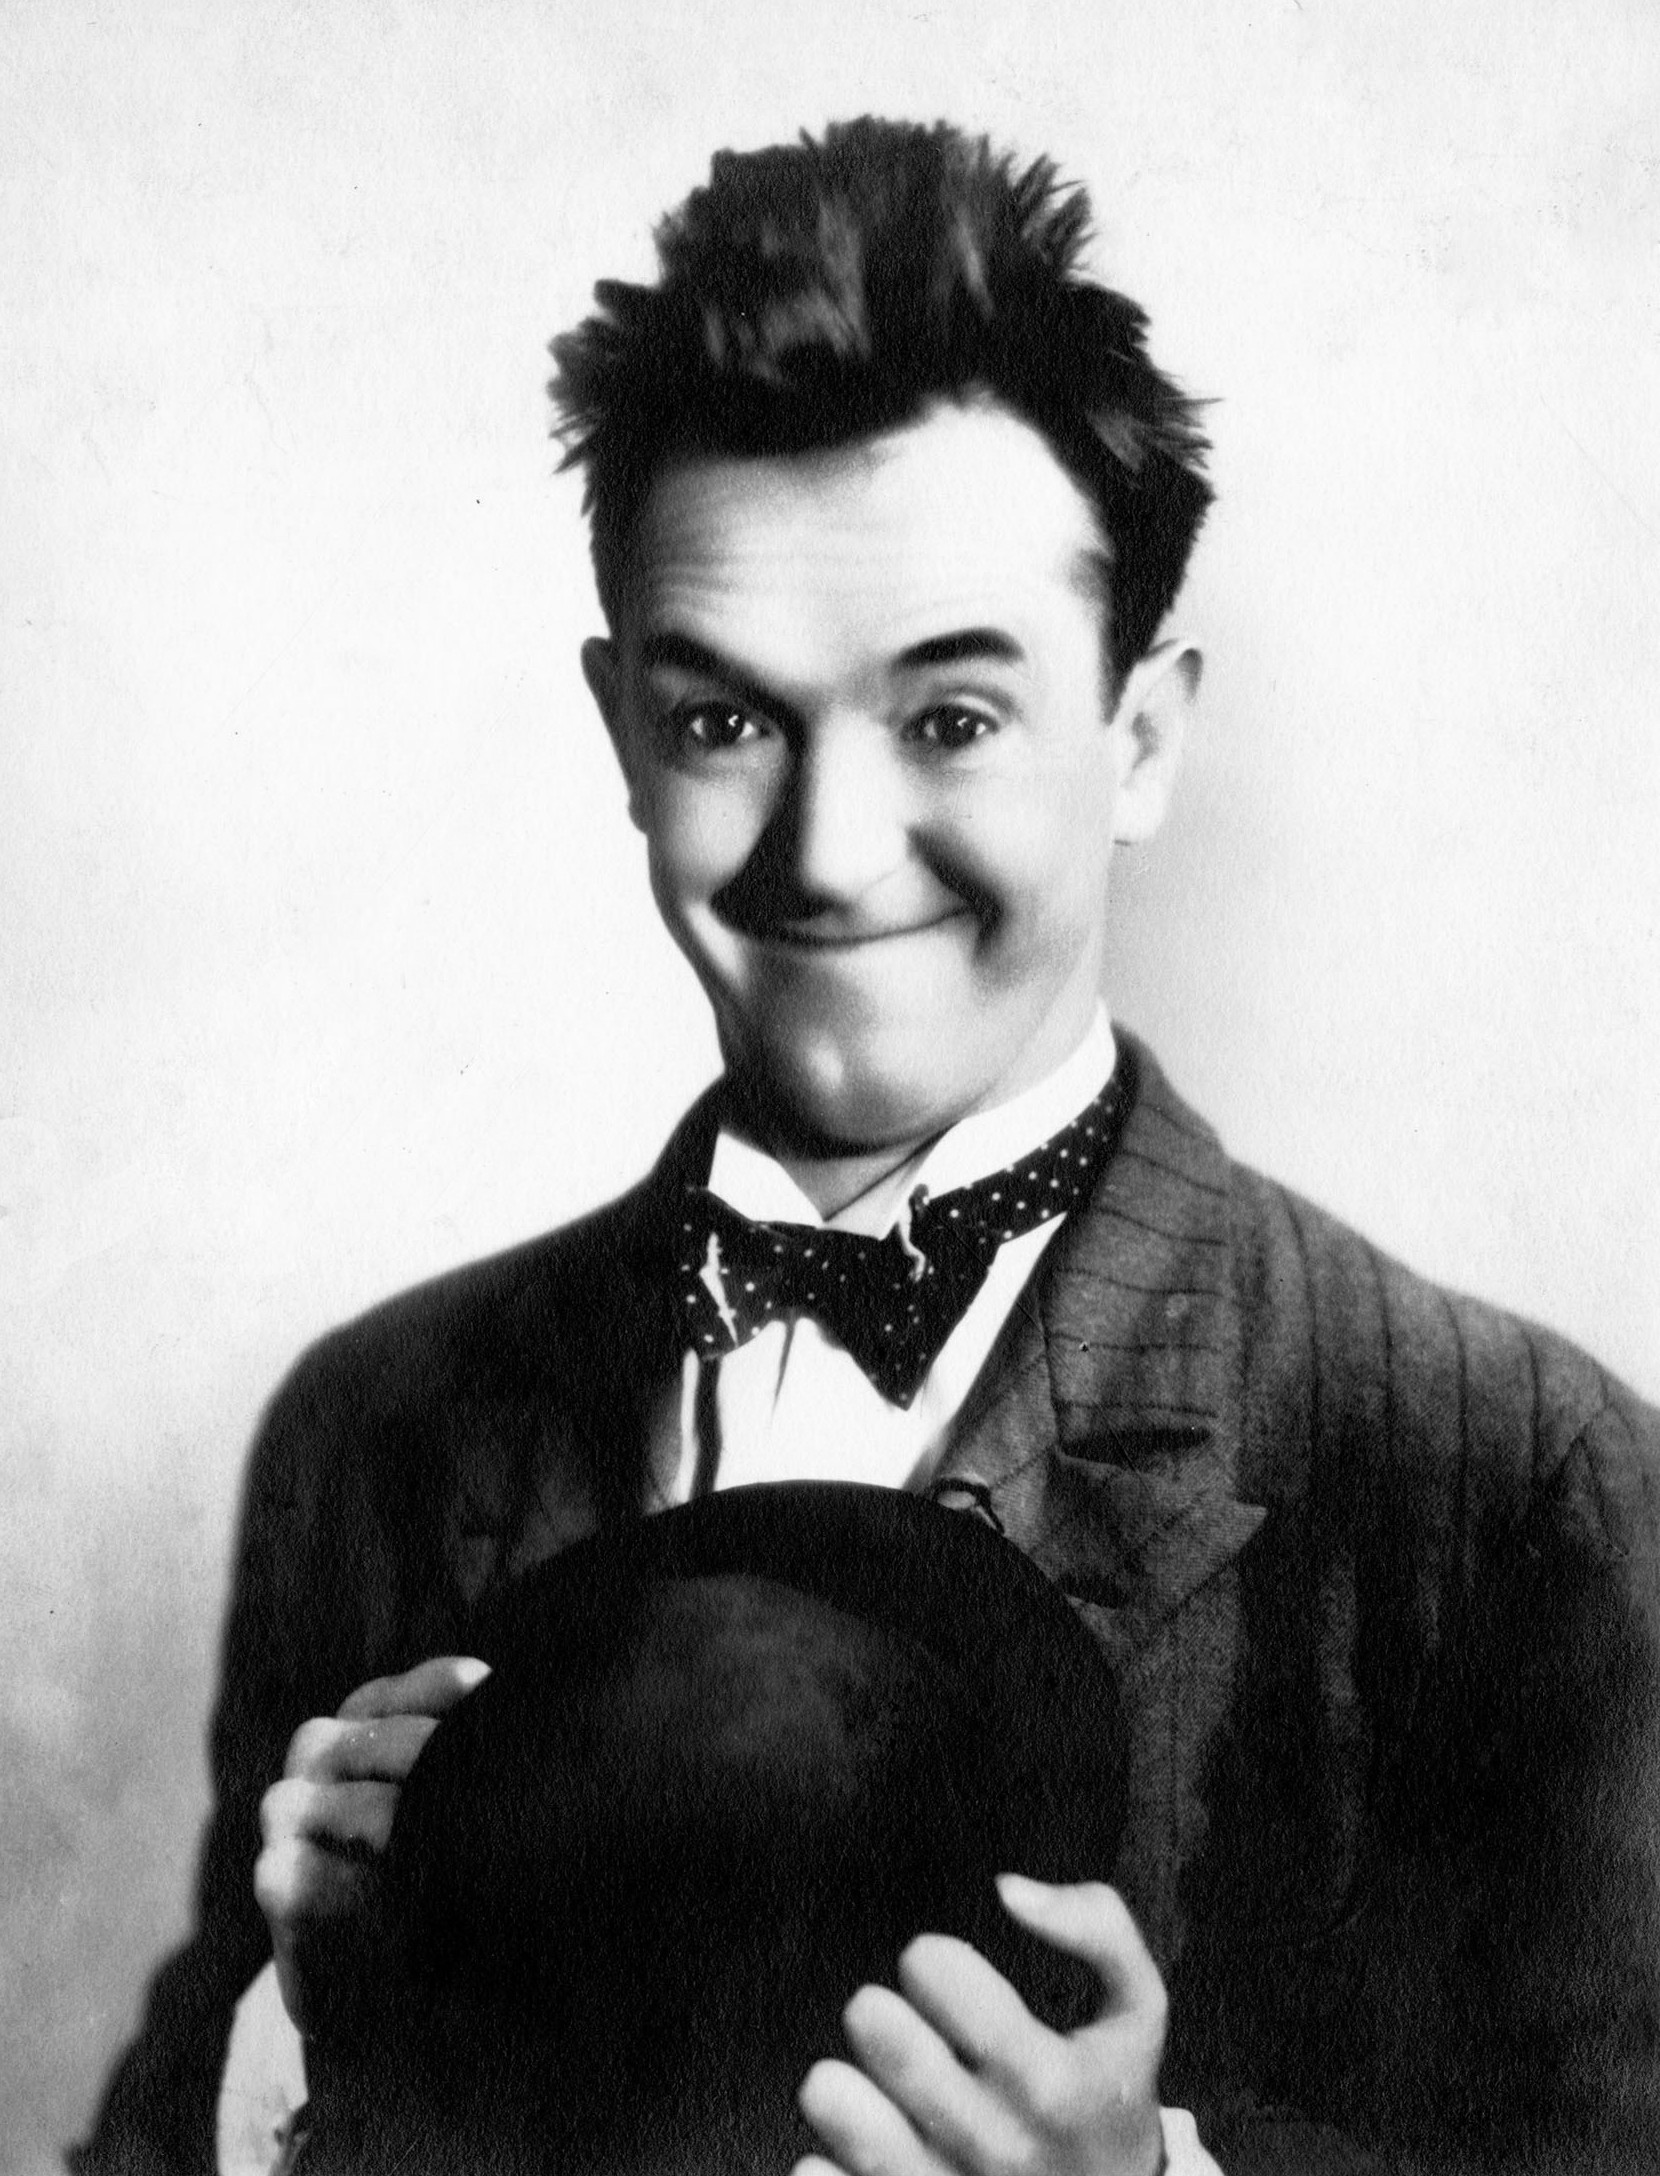 Nom De Laurel Et Hardy : laurel, hardy, Laurel, Wikipédia